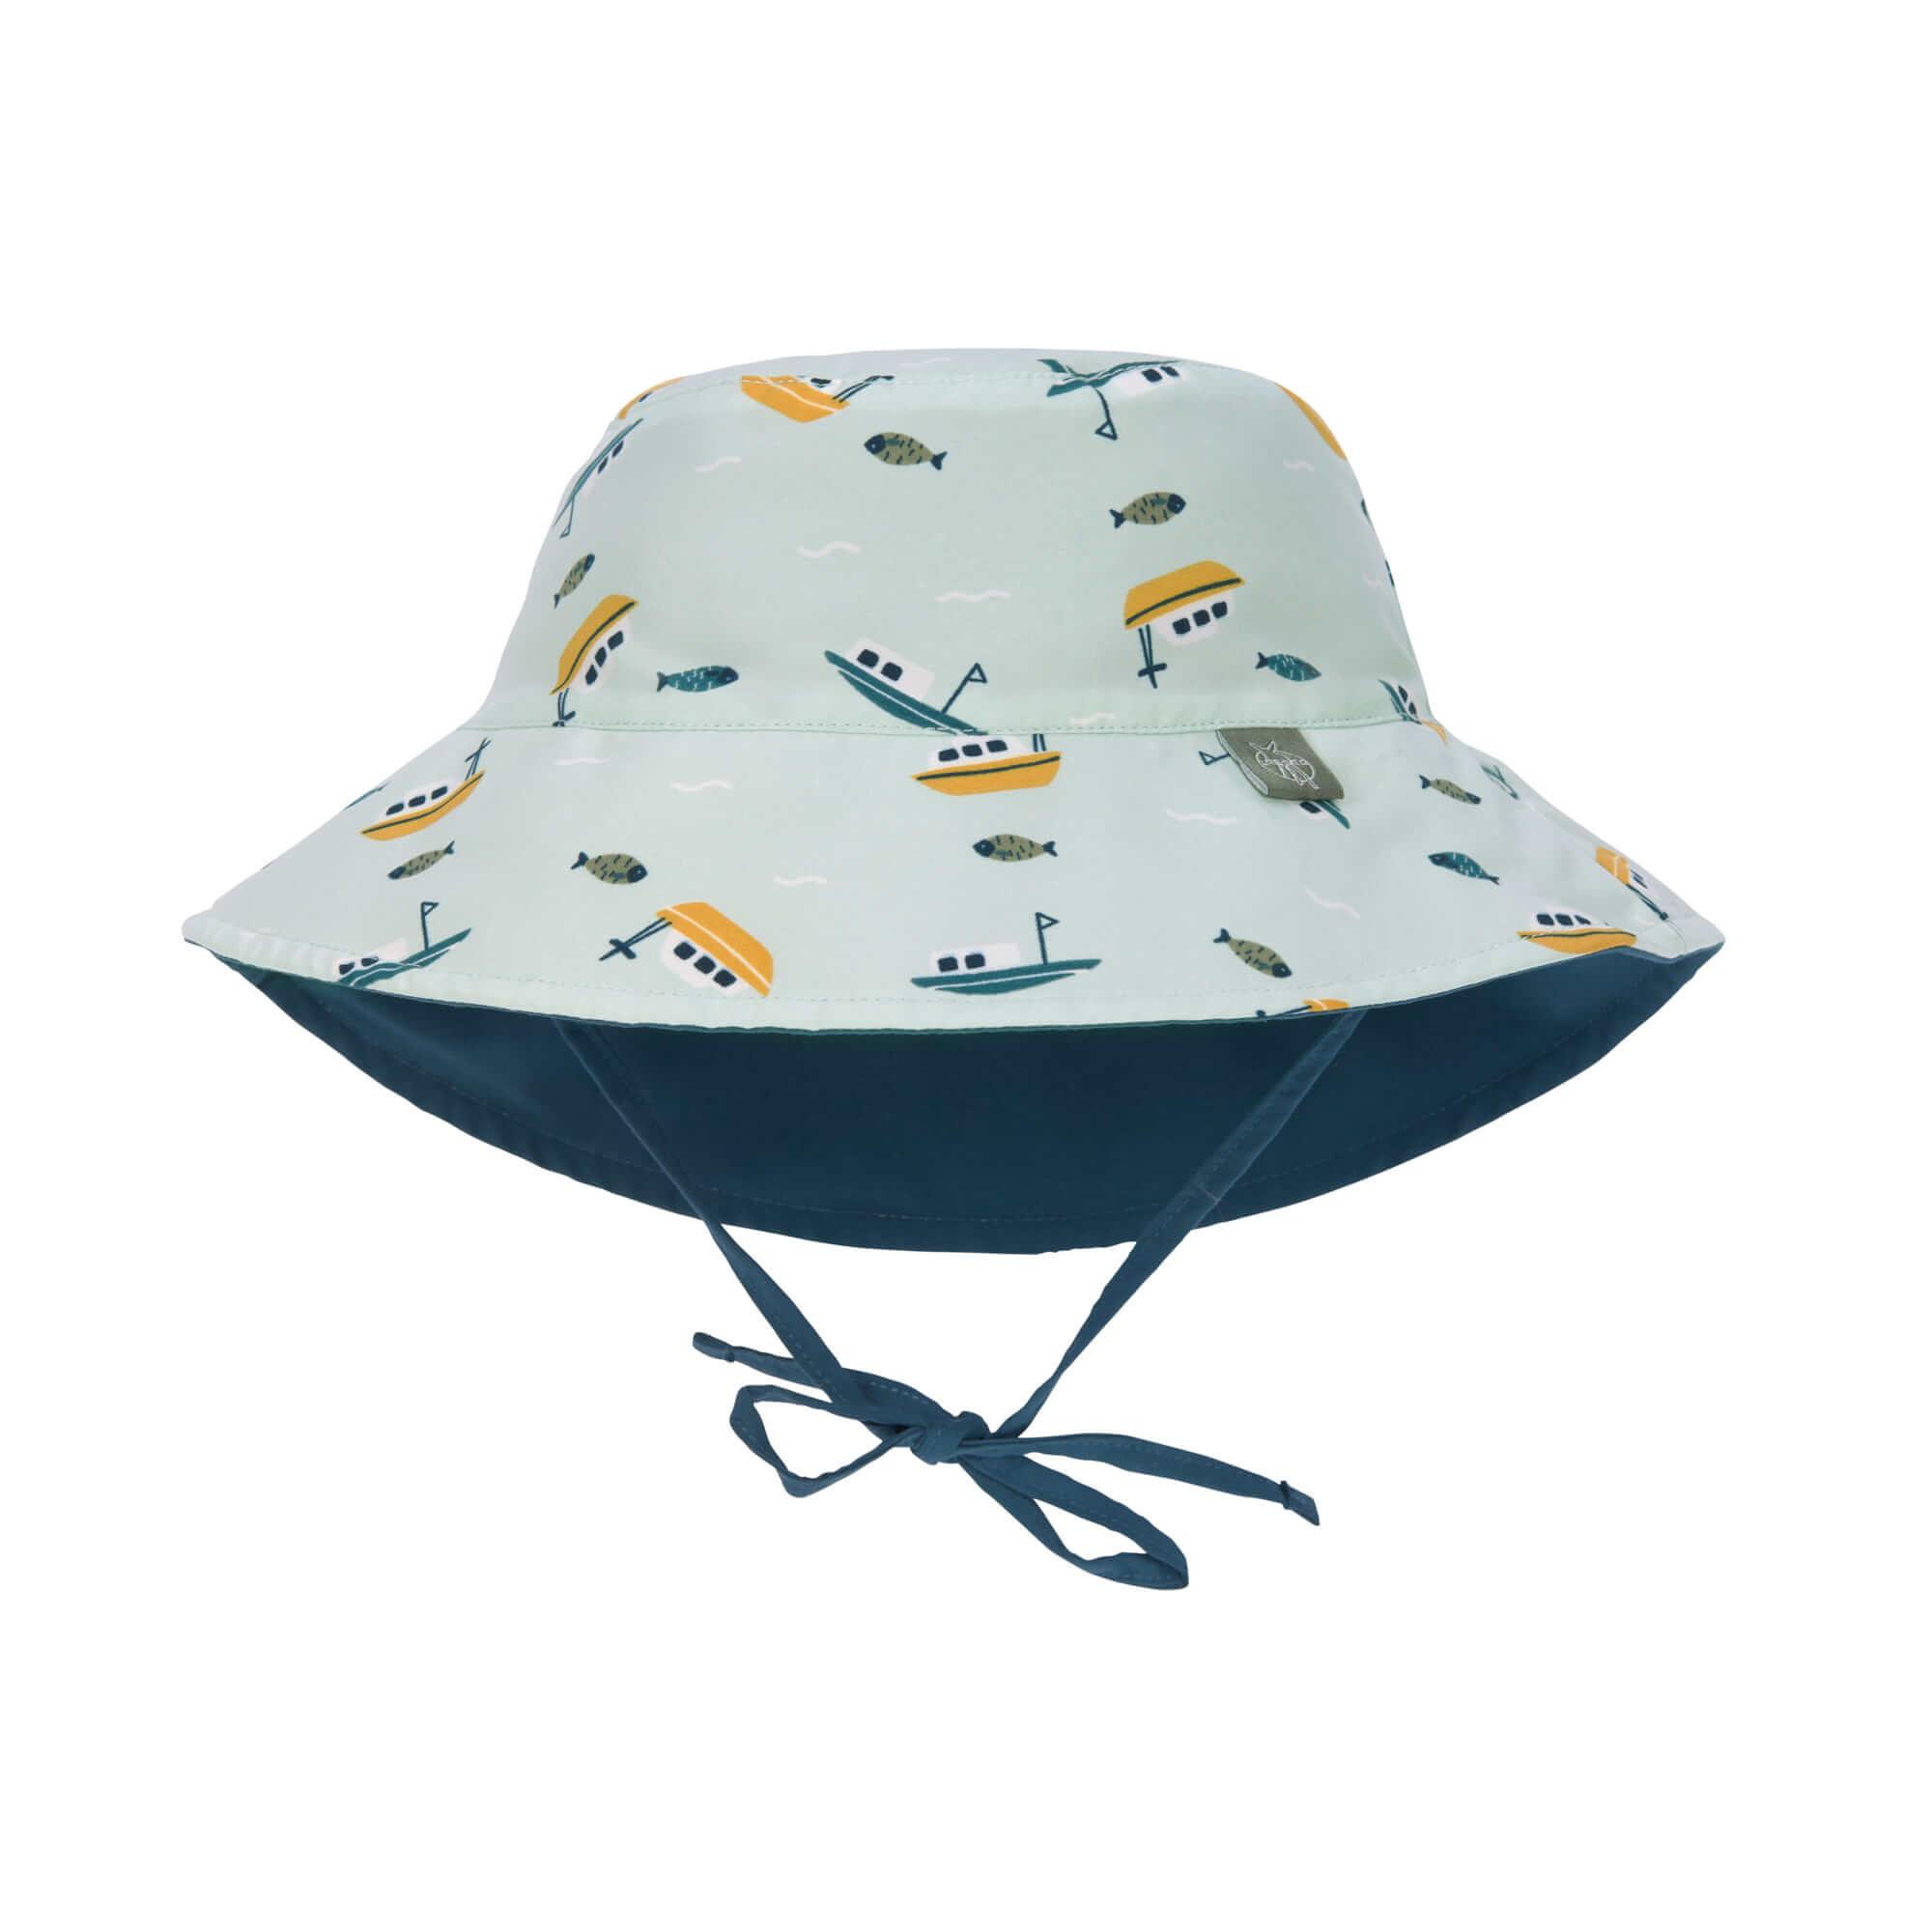 Lässig Splash & Fun Sun Protection Zonnehoed Vissershoed met UV bescherming - Boat mint 19-36 maande